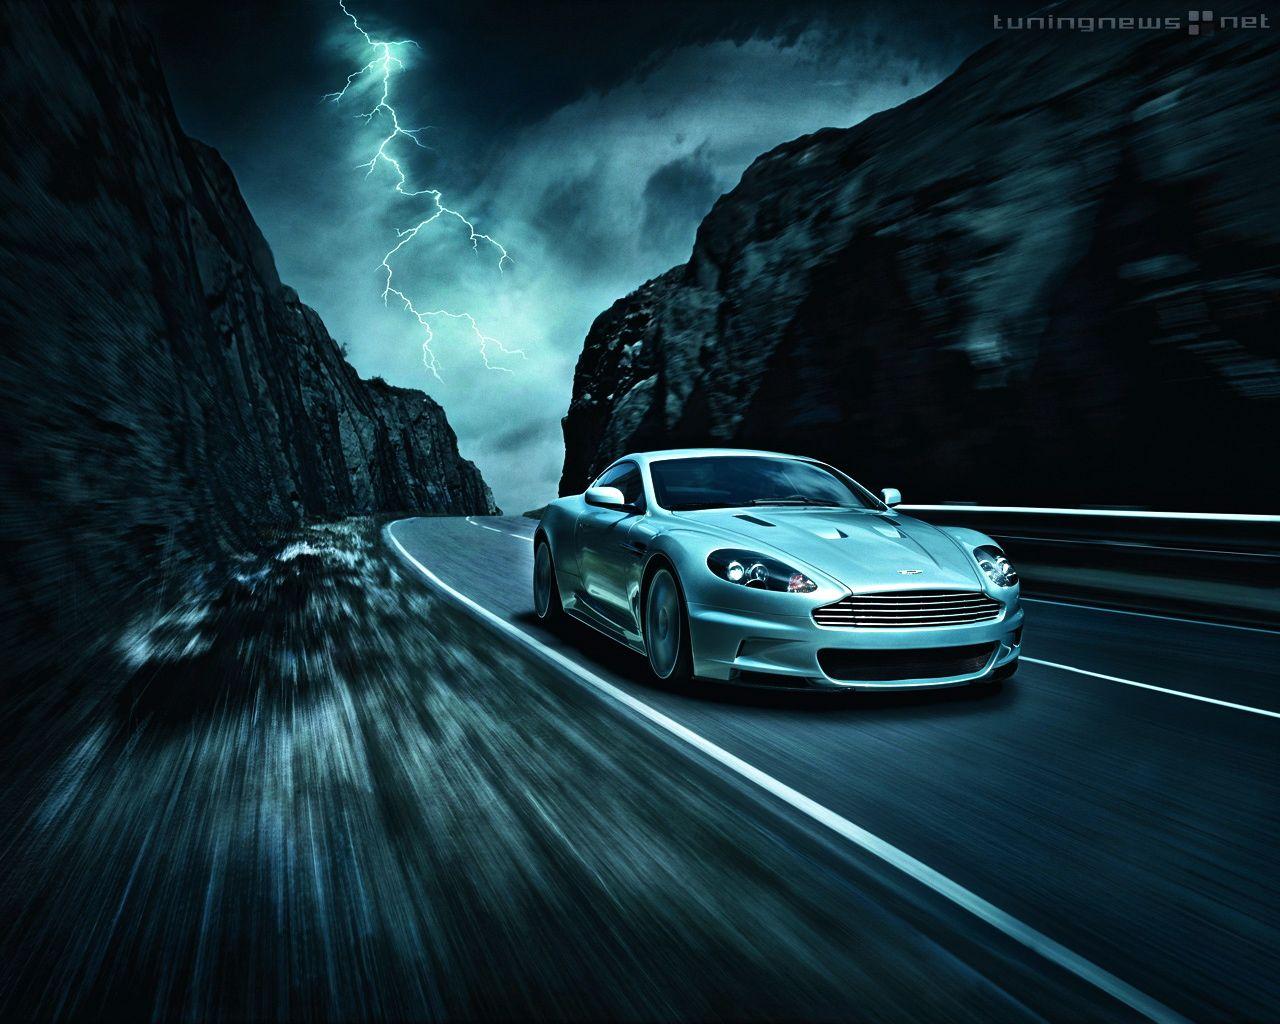 Wallpaper Hd Tablet Wallpaper Car Wallpapers Aston Martin